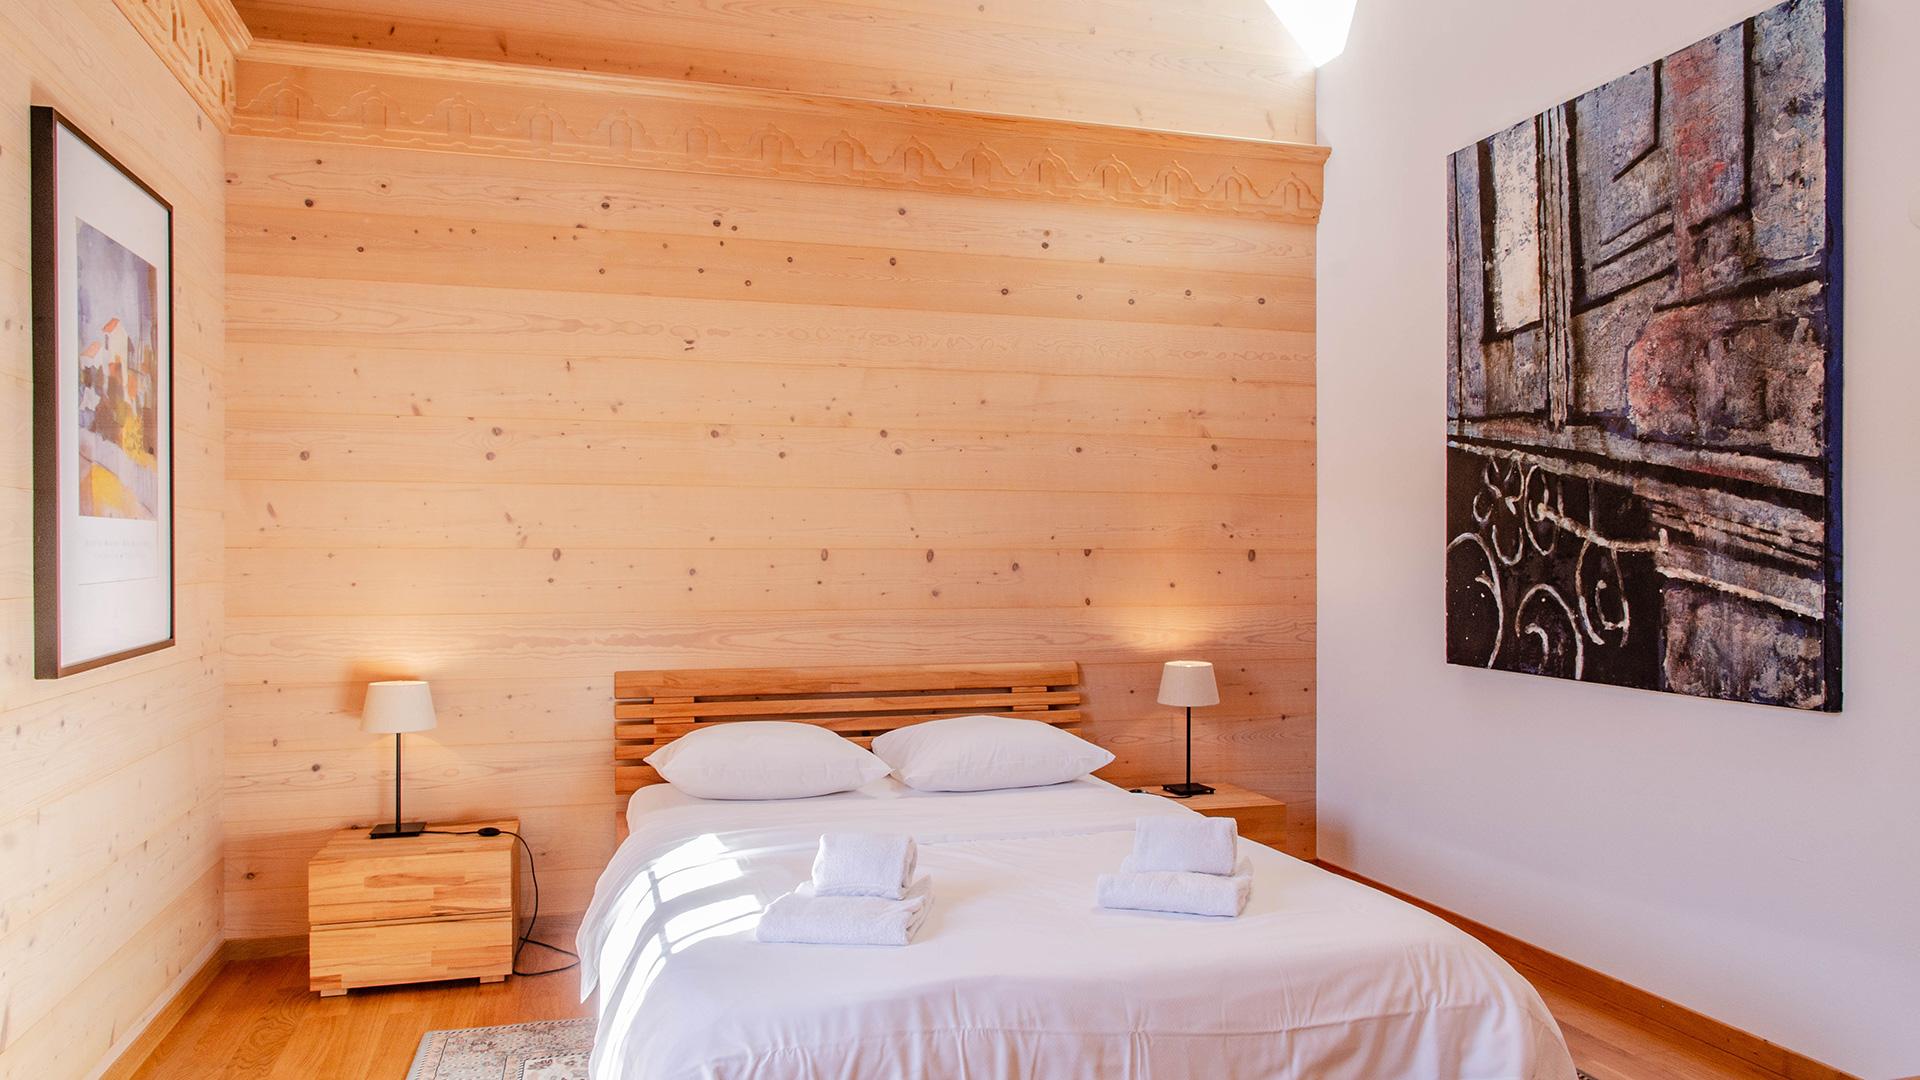 Snowflake Apartments, Switzerland